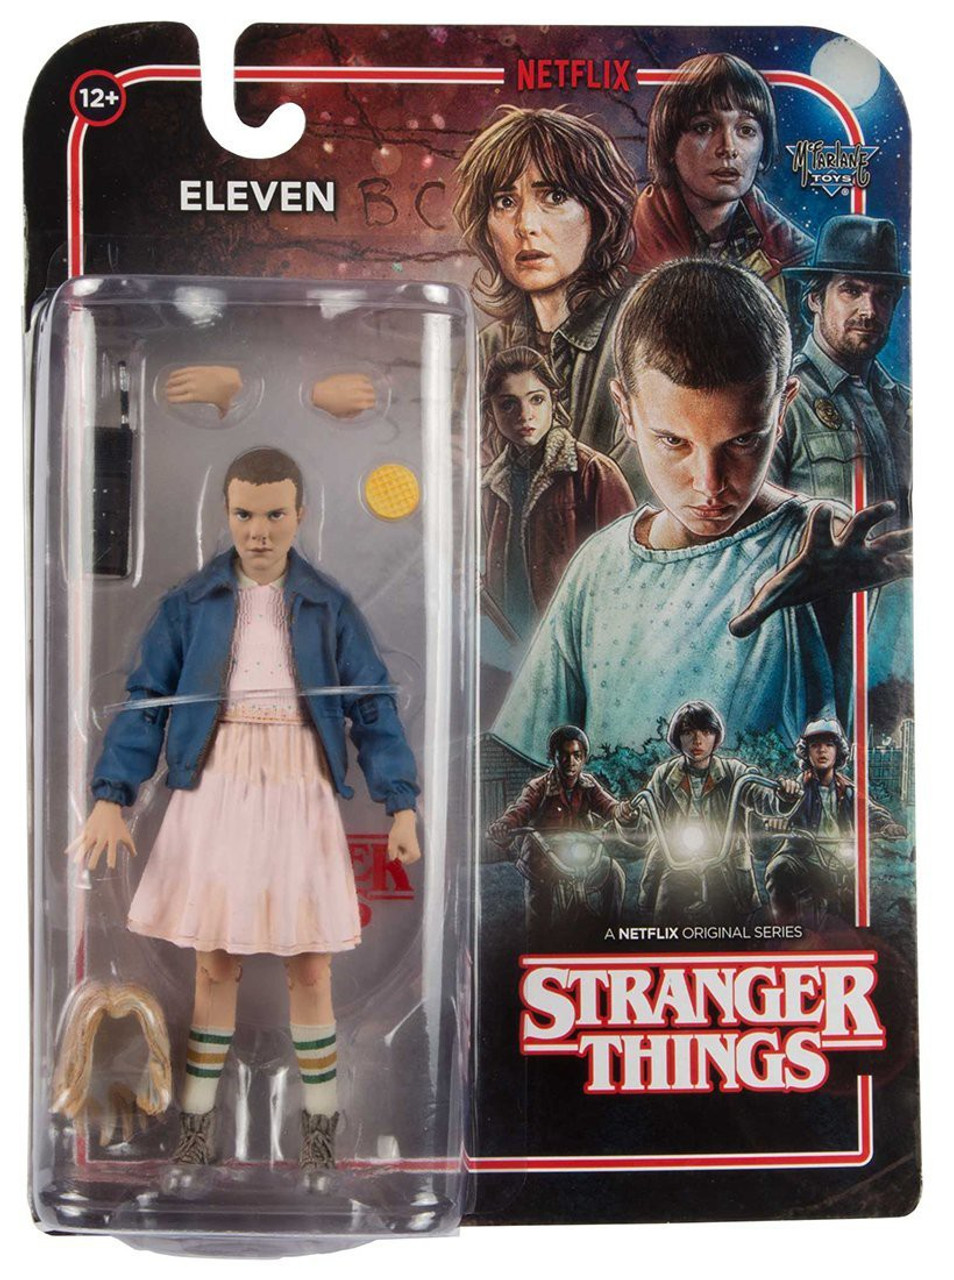 2017 McFarlane NETFLIX Stranger Things Series 1 LUCAS Action Figure